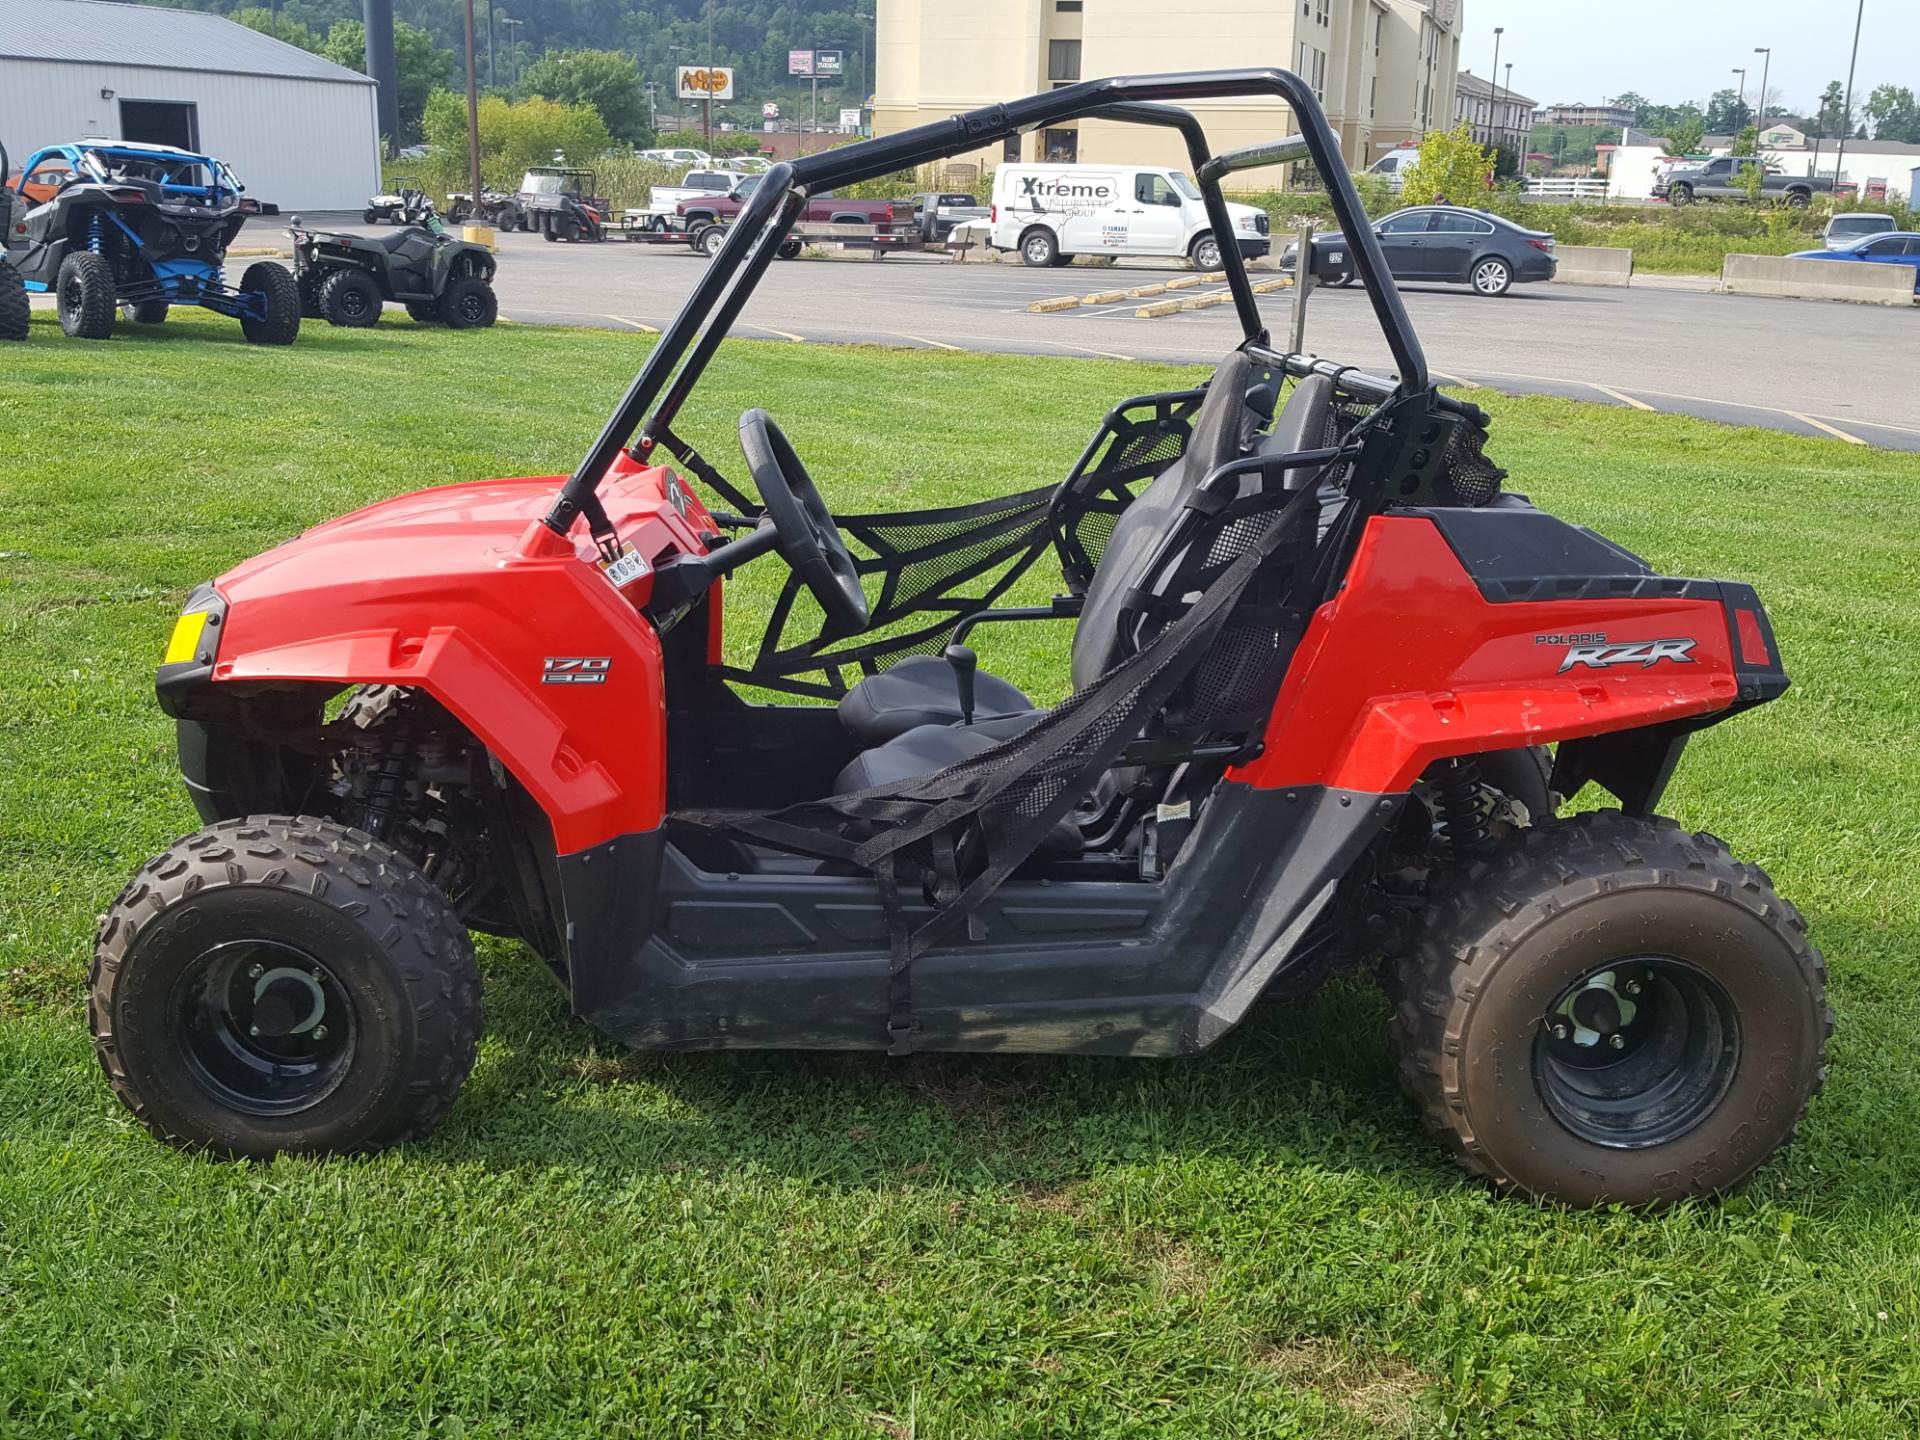 2015 Polaris RZR 170 EFI for sale 232277